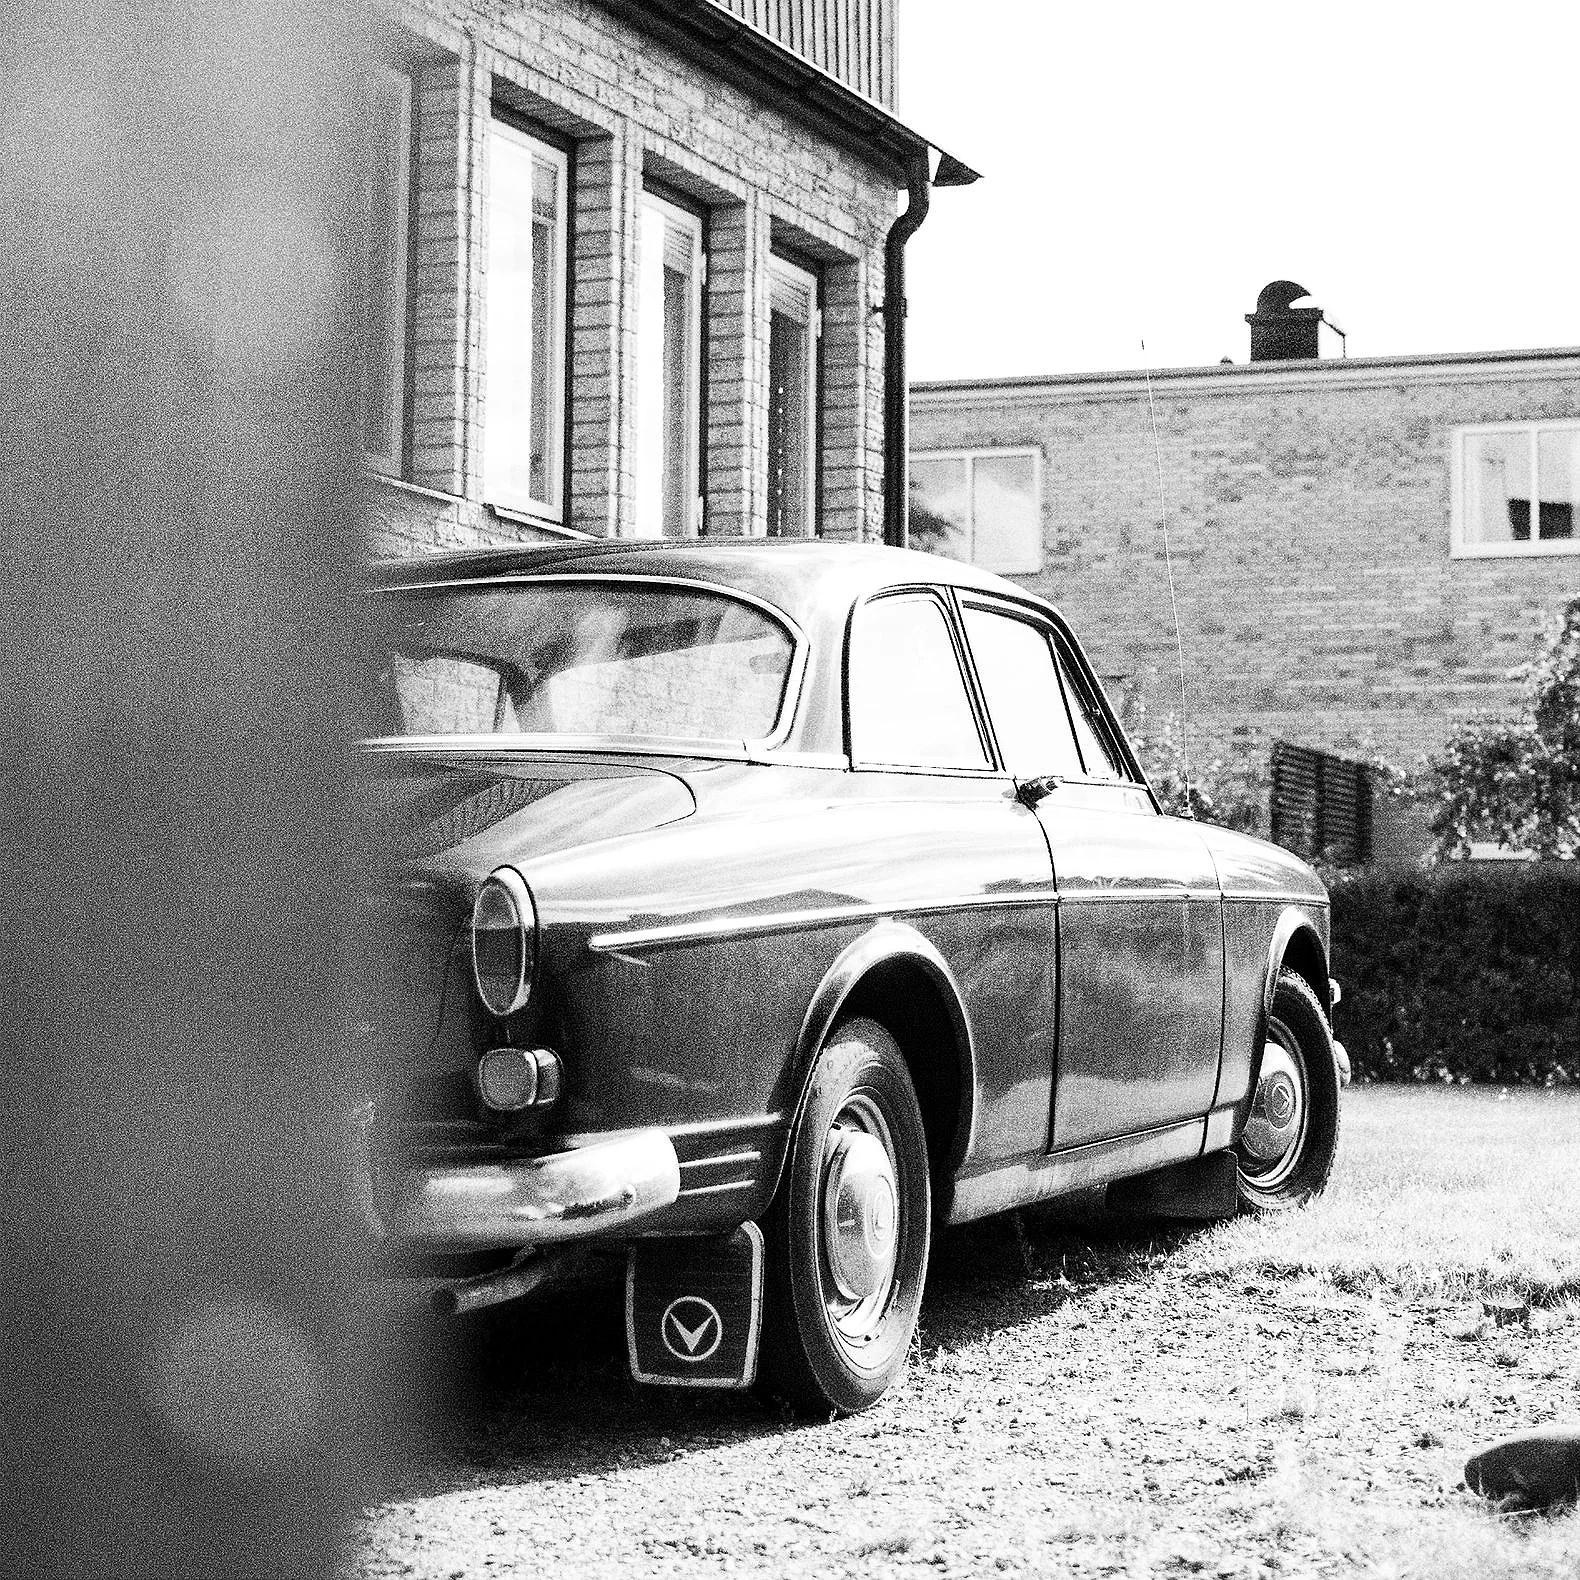 B&W VINTAGE CAR